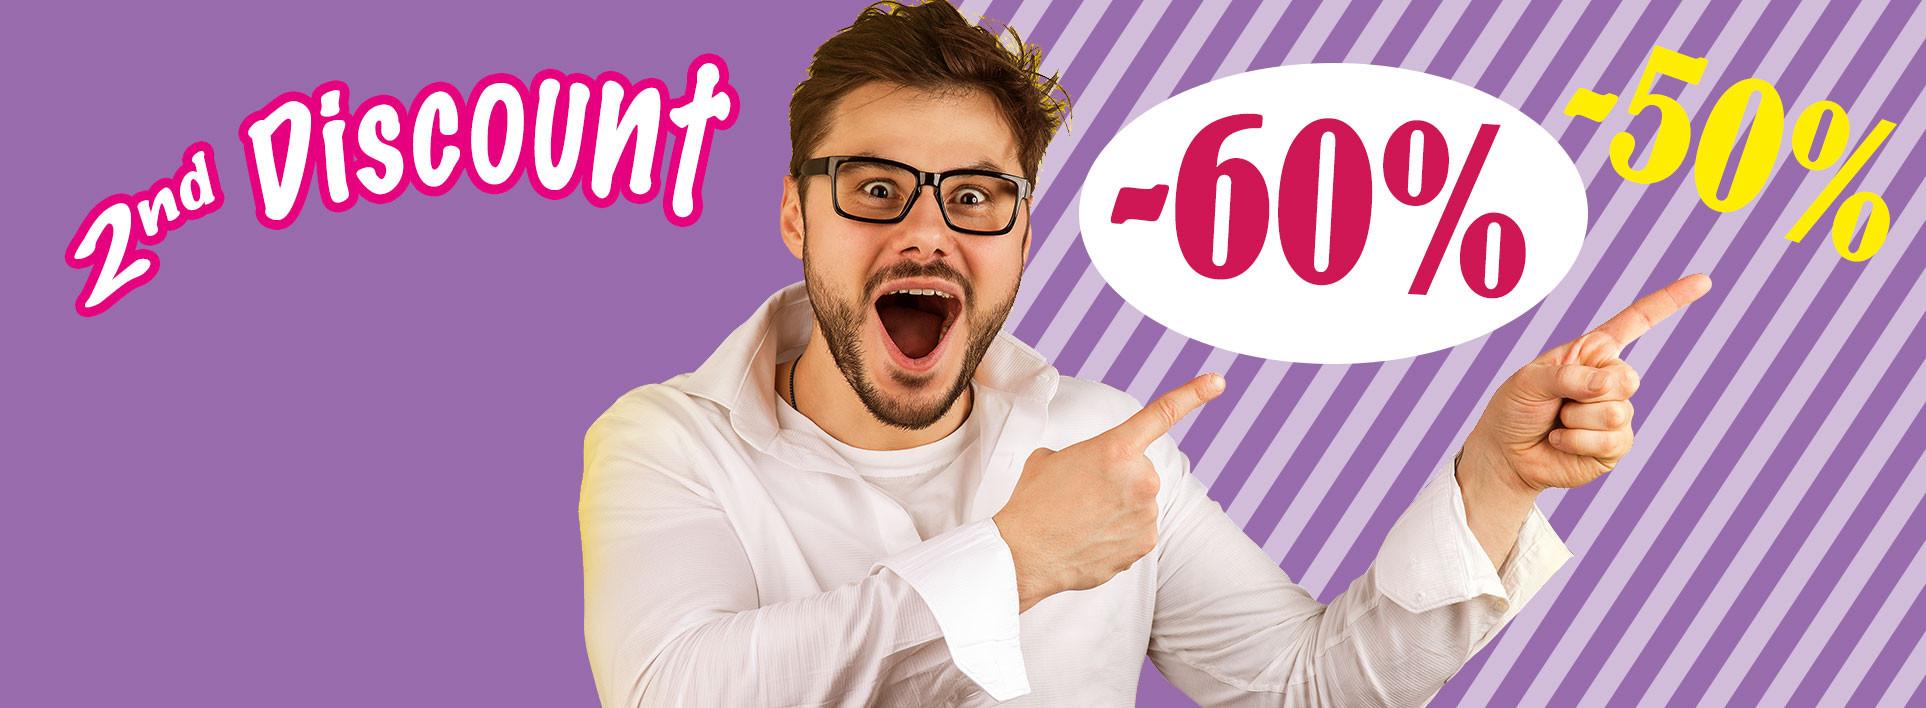 sales -50%men shirts